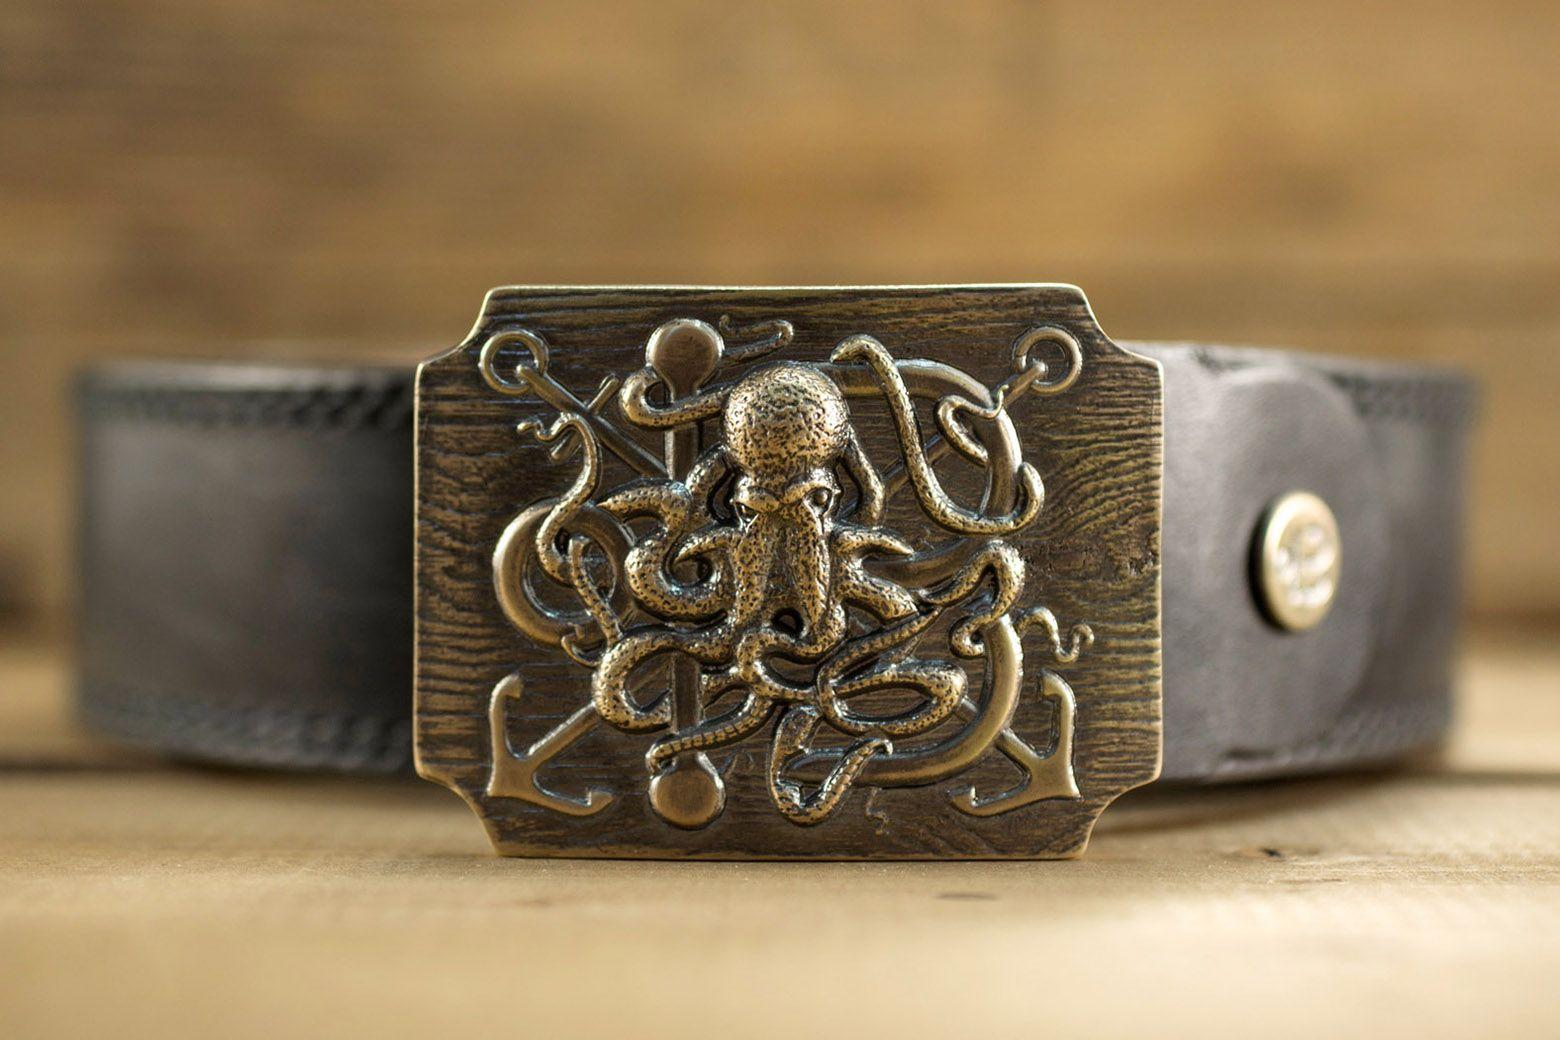 Arts,crafts & Sewing Back To Search Resultshome & Garden Vintage Metal Beer Opener Belt Buckle Fashion Heavy Belt Buckles Diy Strap Cowboy Men Hebilla Cinturon Accessories For 4cm Belts